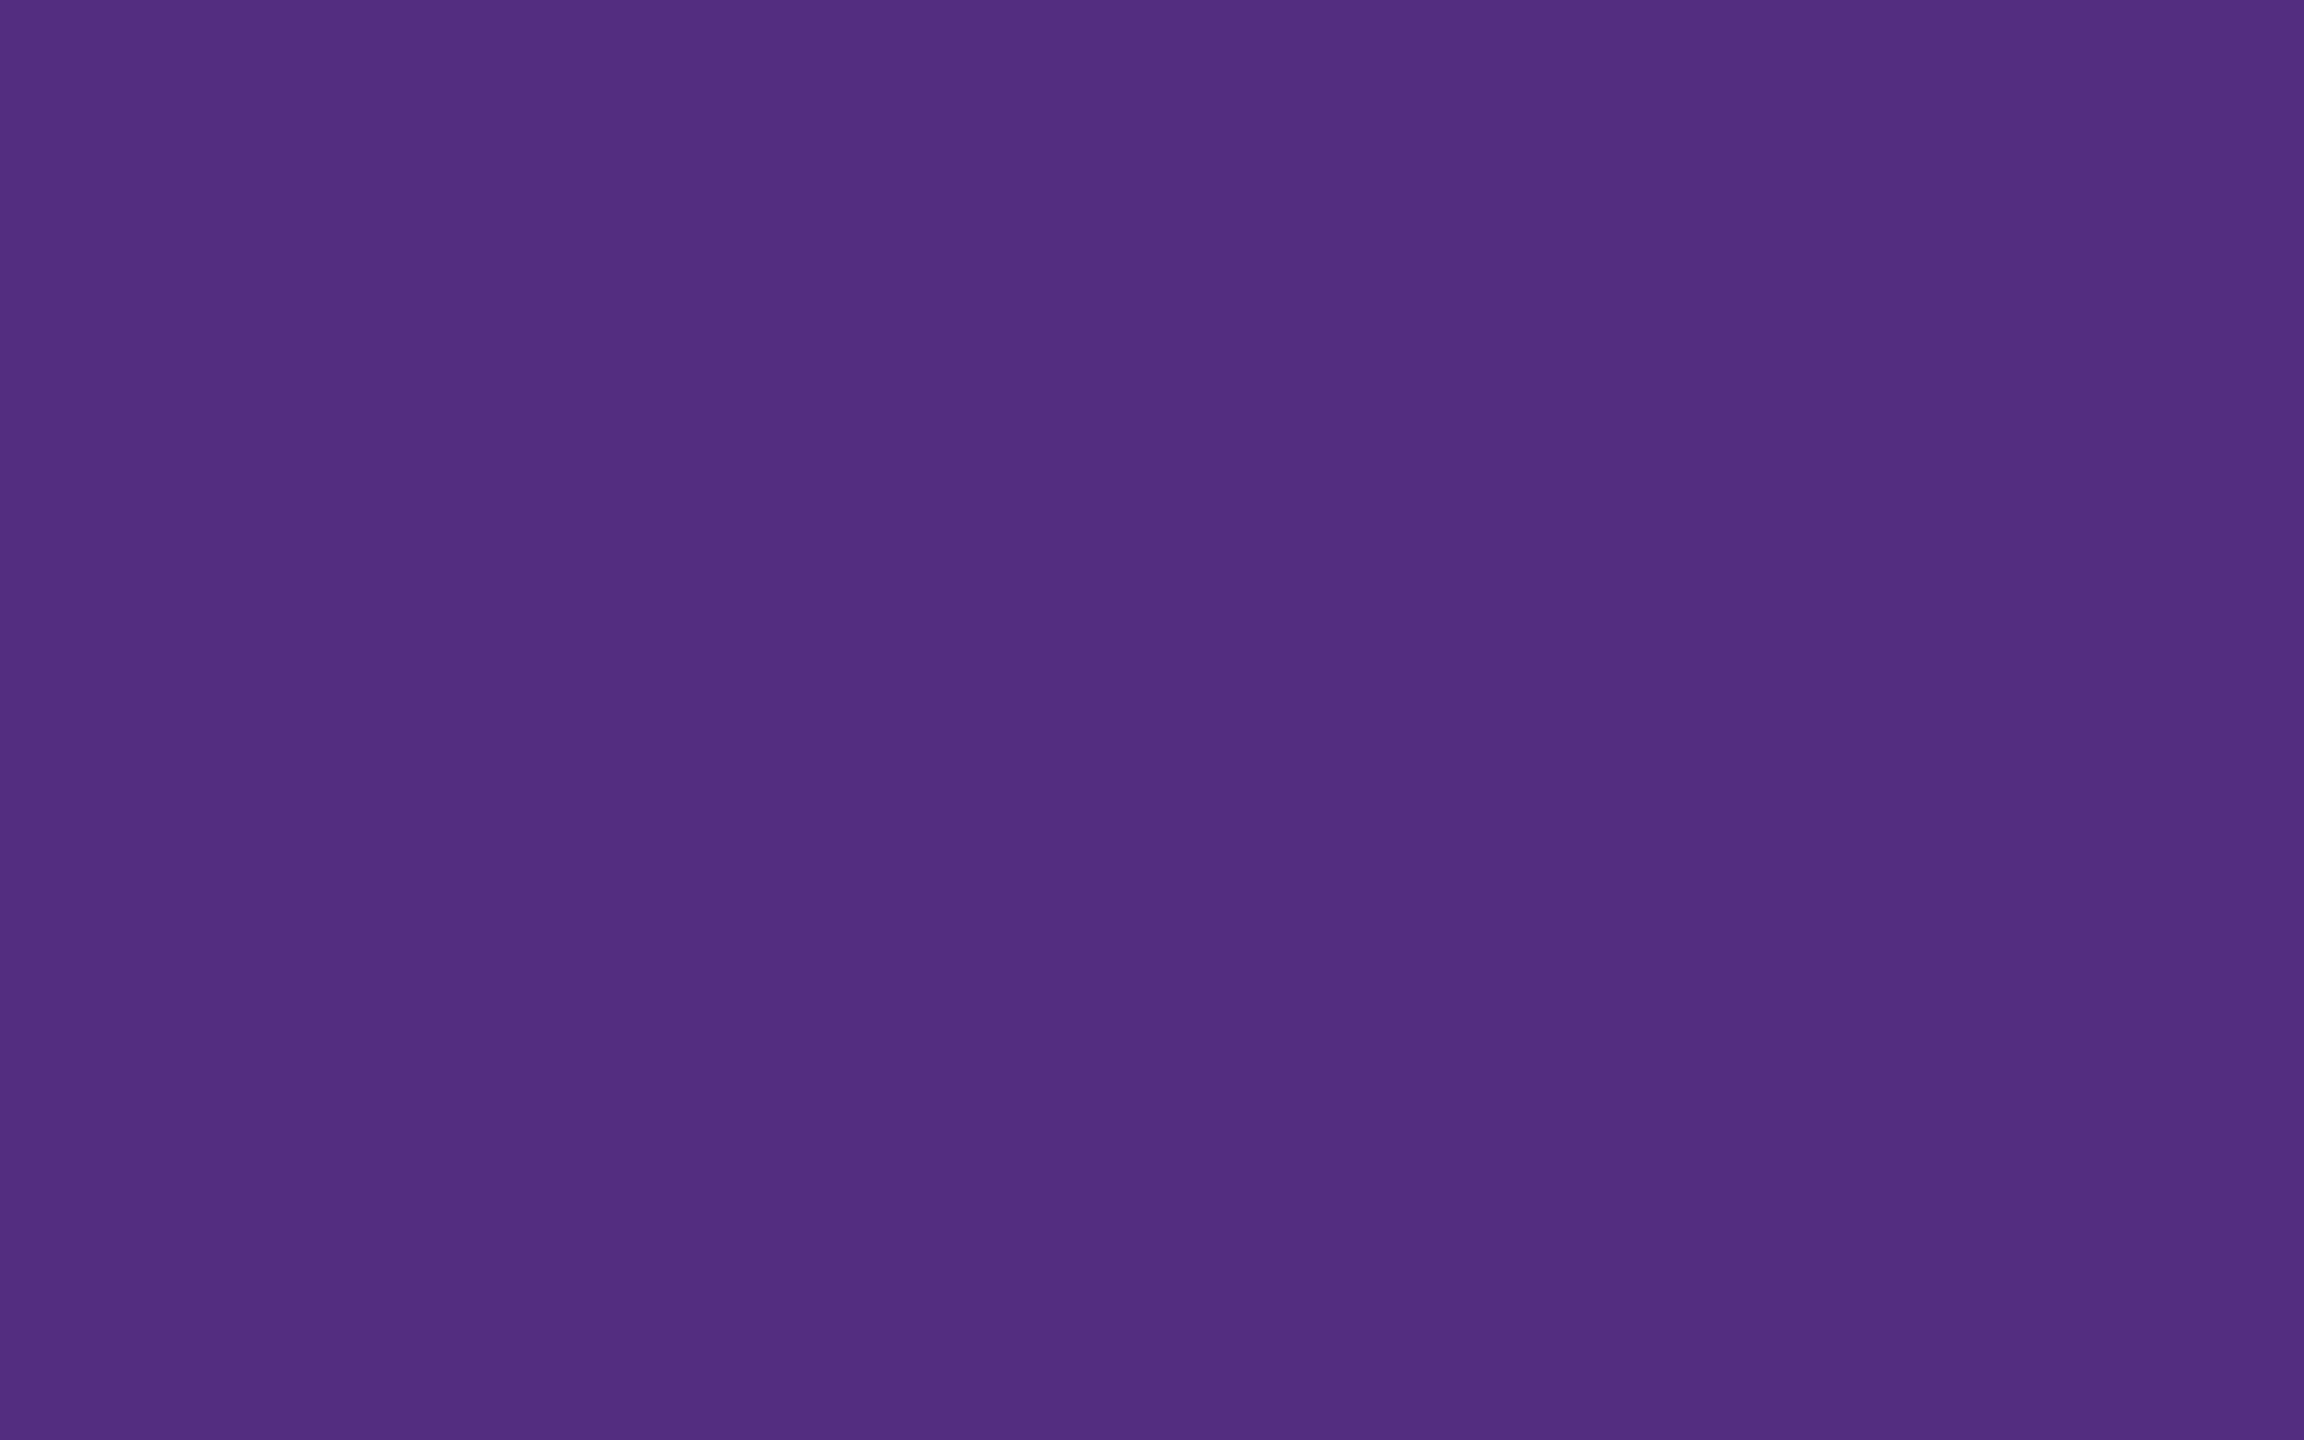 2304x1440 Regalia Solid Color Background